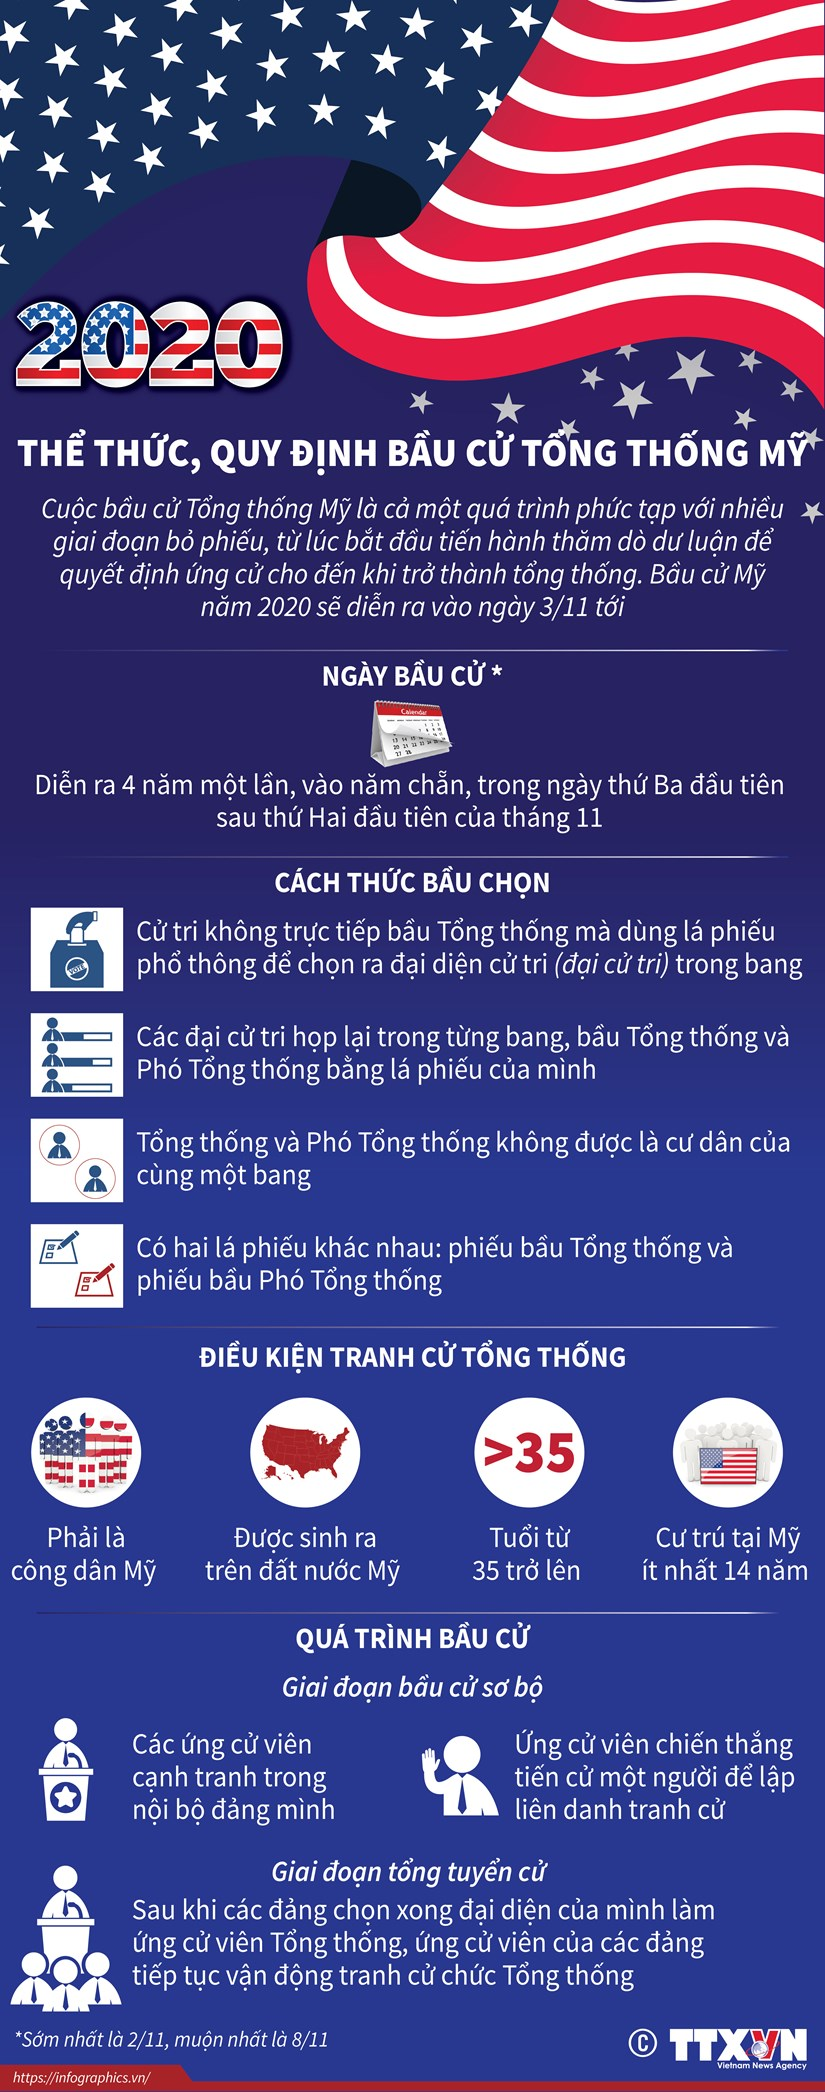 [Infographics] The thuc va quy dinh bau cu Tong thong My hinh anh 1